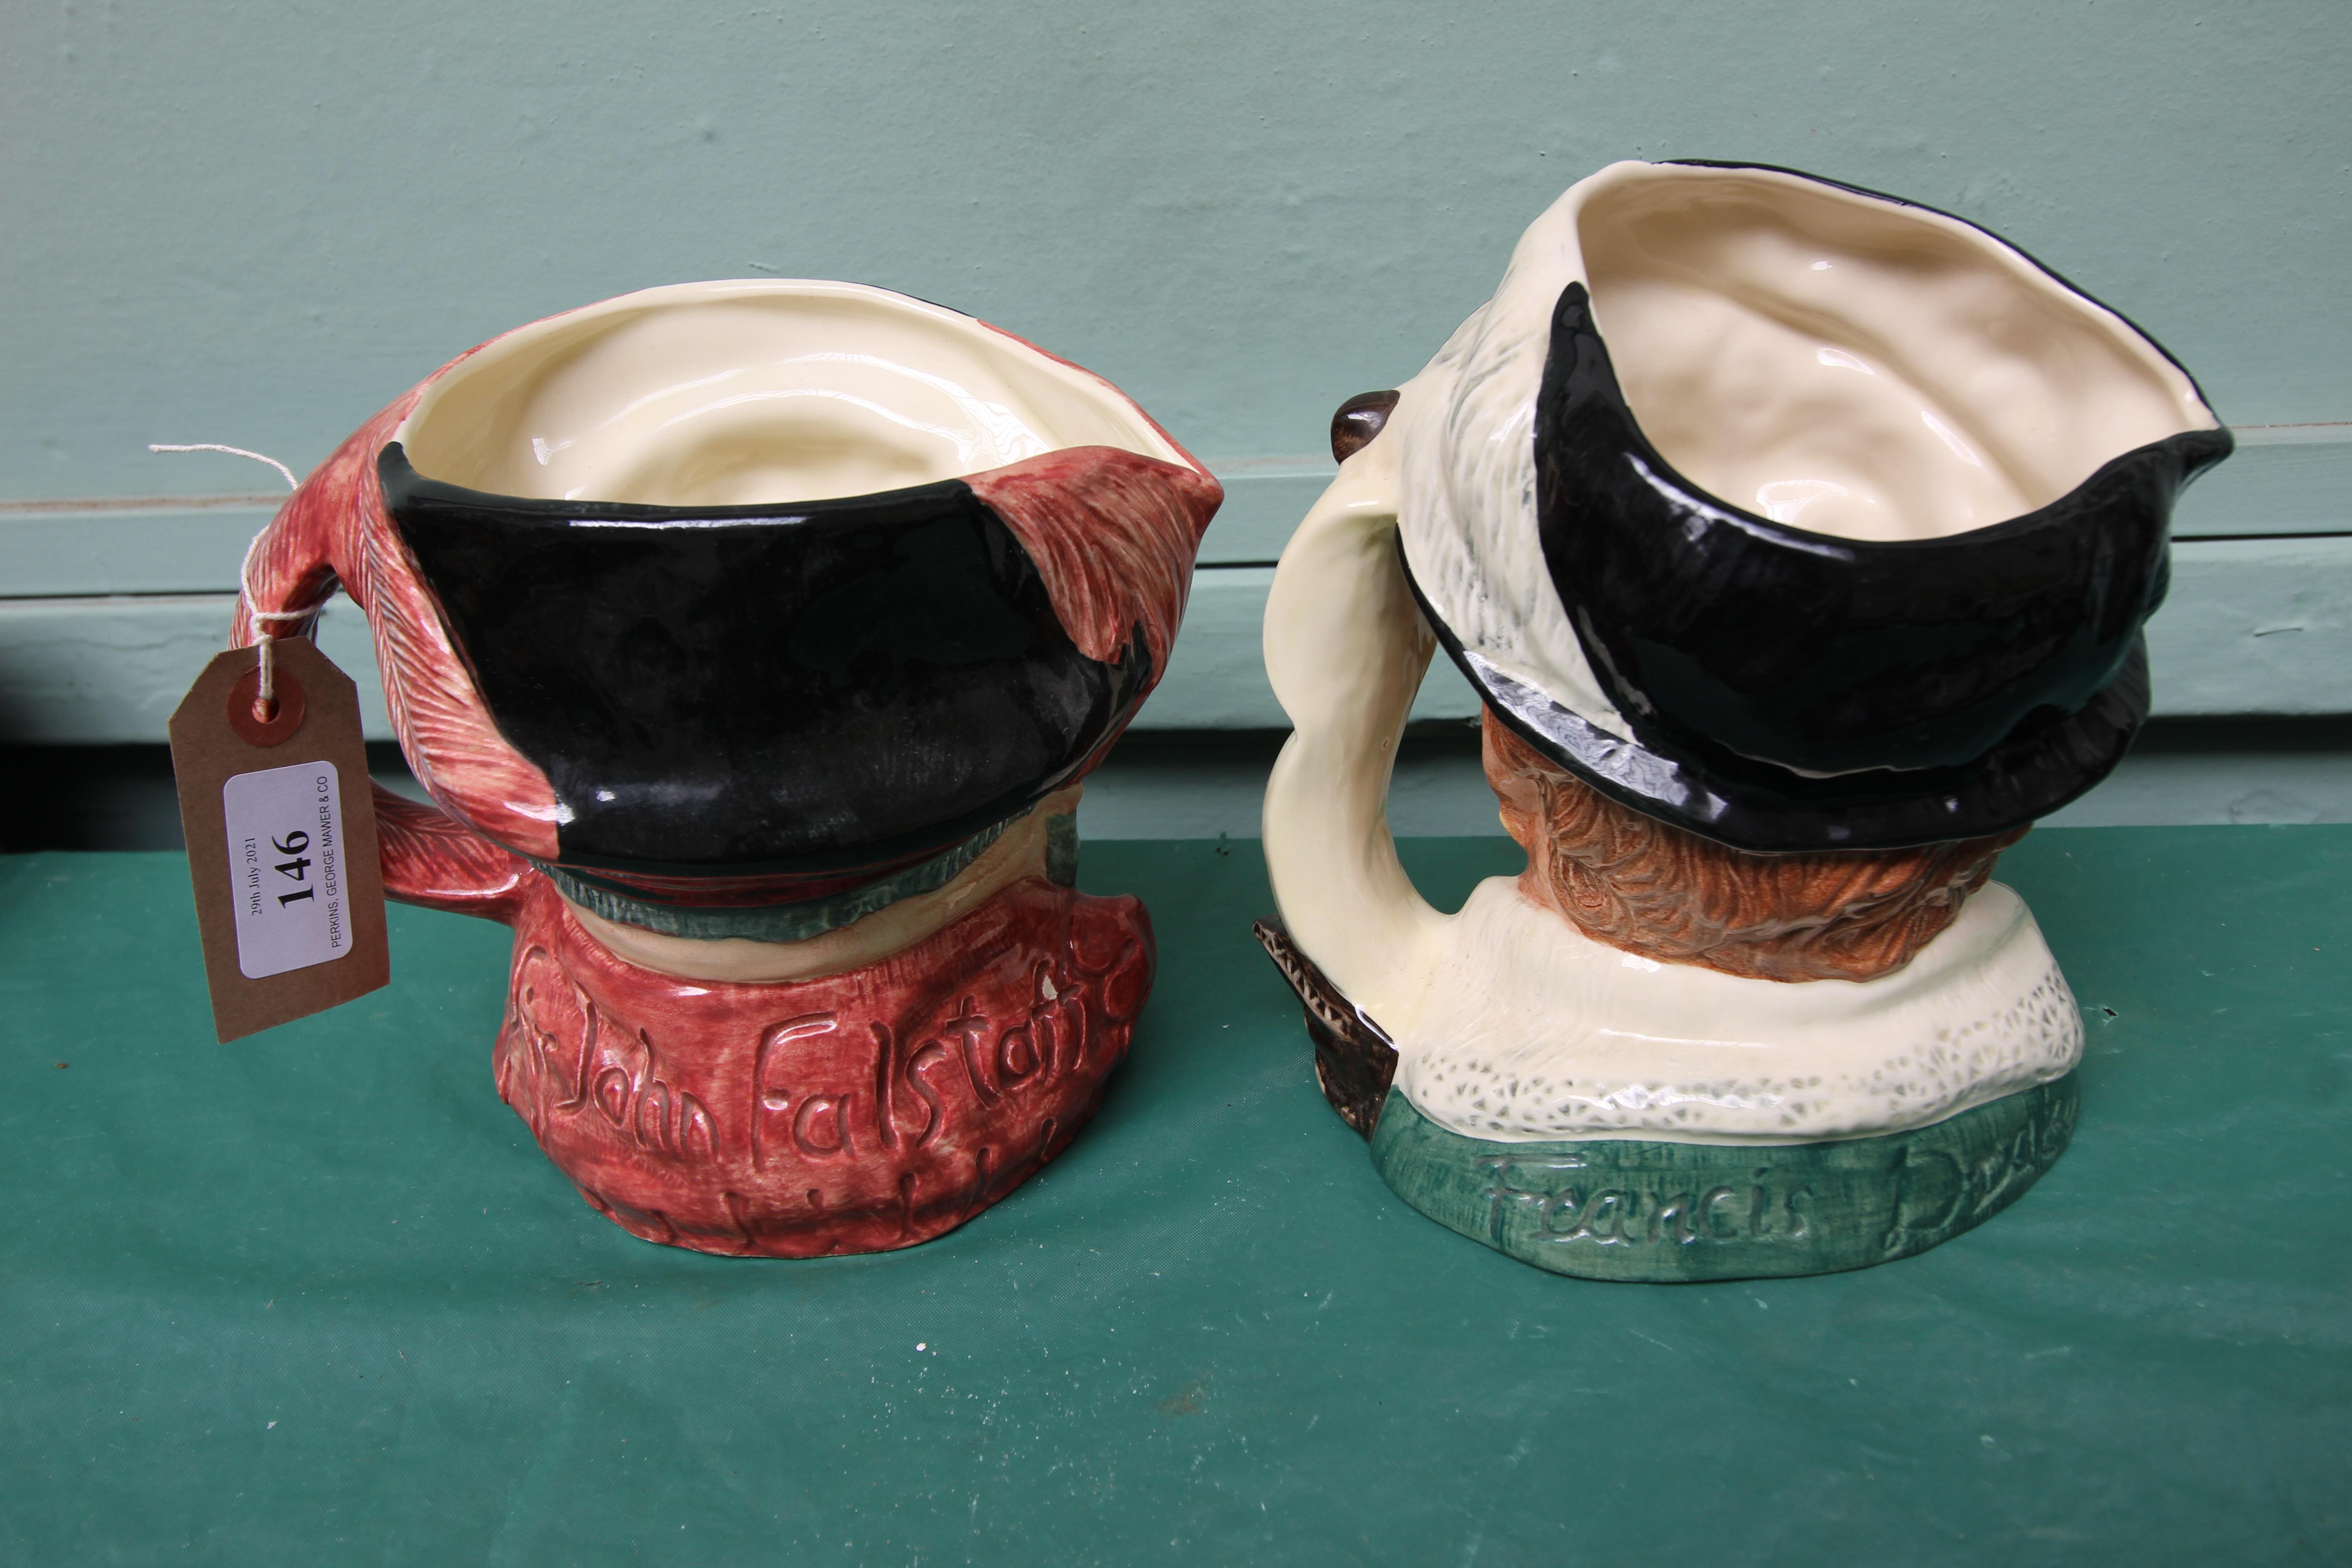 2 large Royal Doulton character jugs, - Image 2 of 2